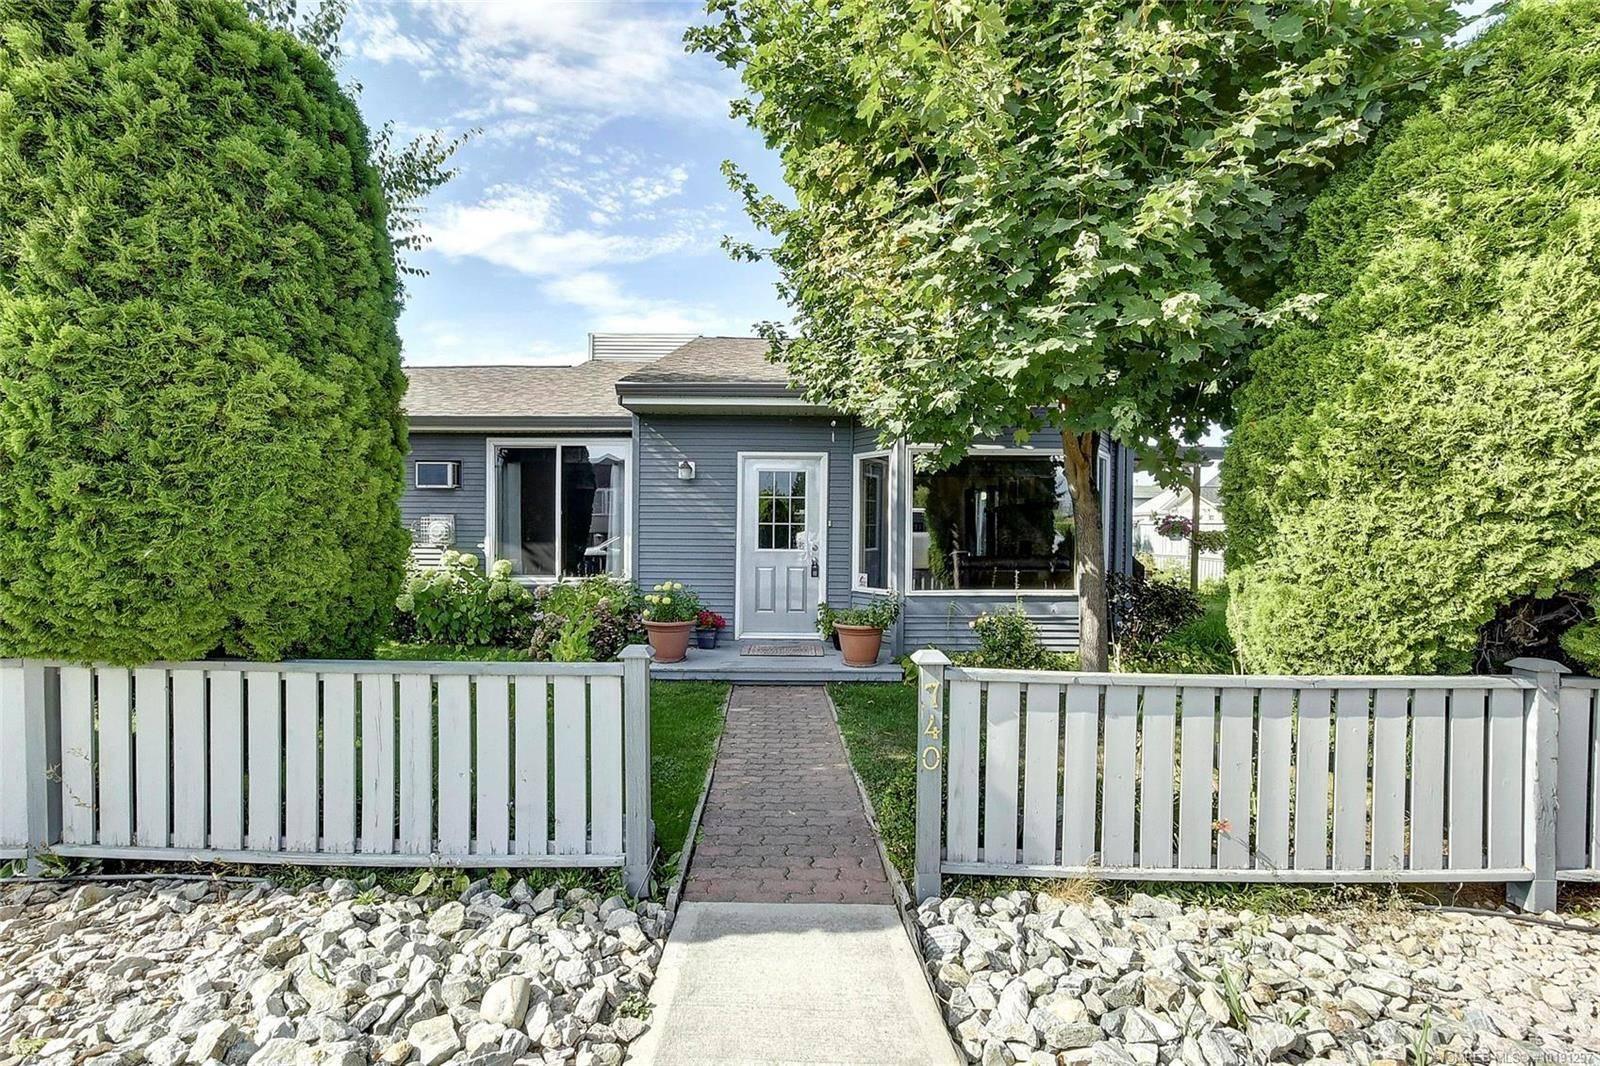 House for sale at 740 Swordy Rd Kelowna British Columbia - MLS: 10191297